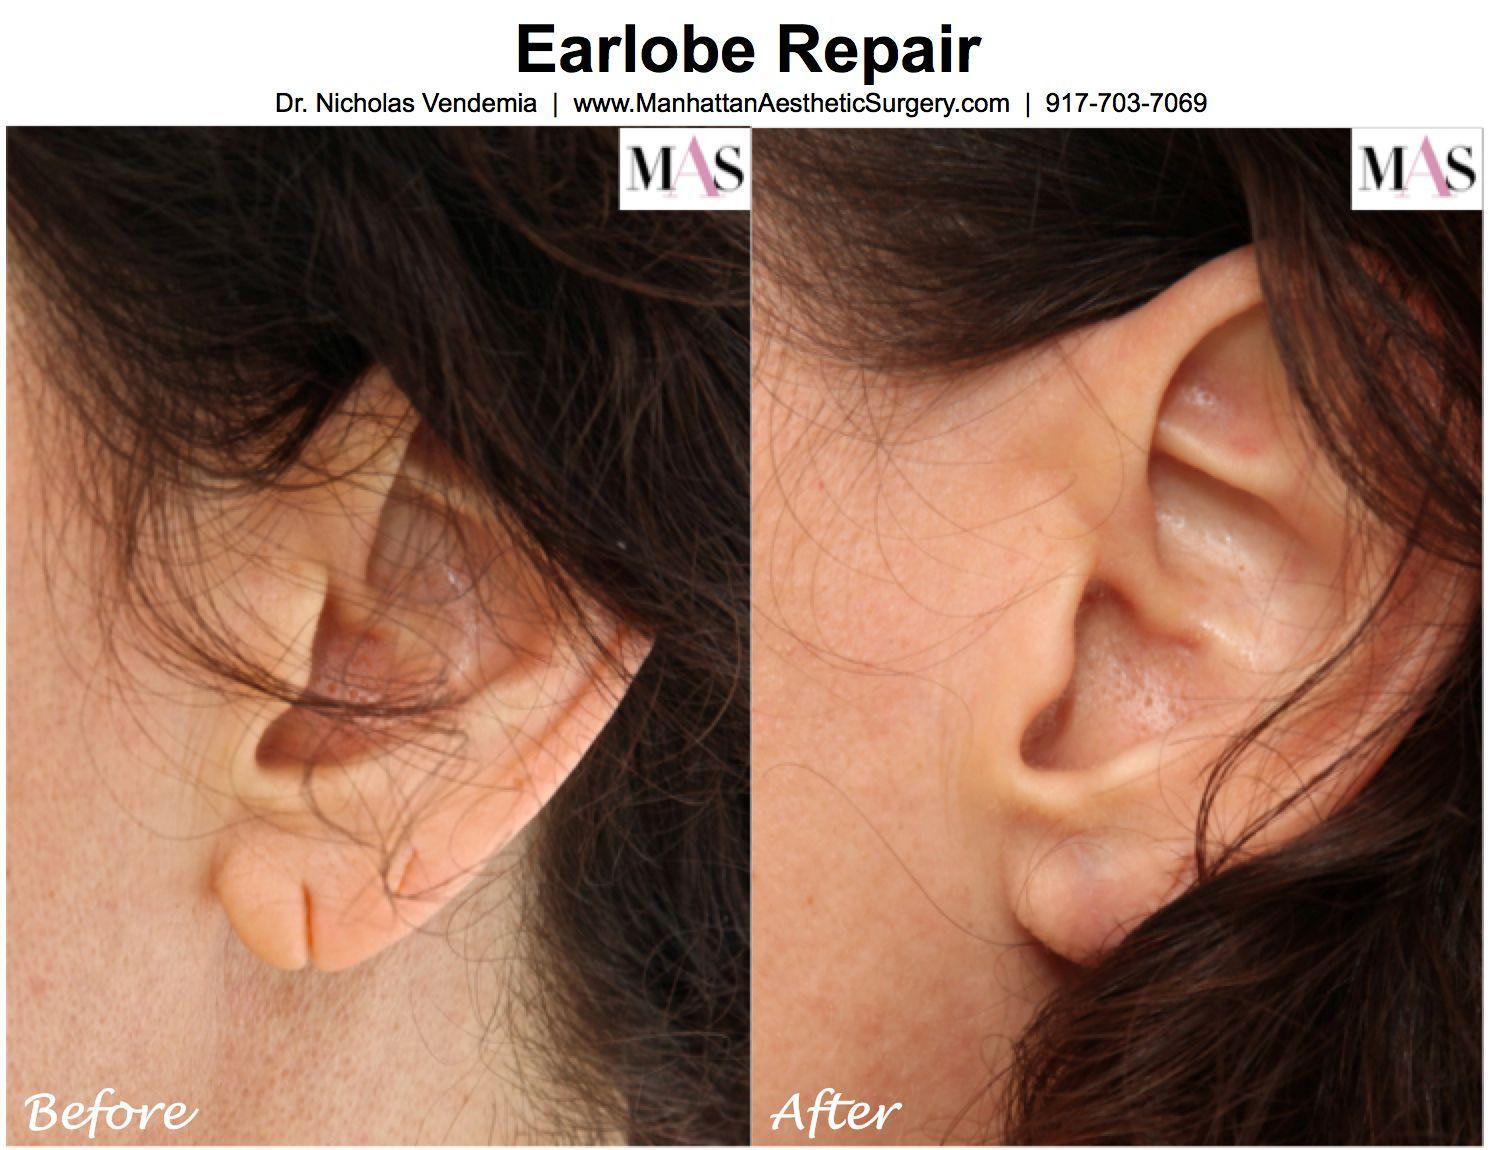 Earlobe Repair Is A Fairlymon Procedure, And The Mostmon Cause Is A  Gradual